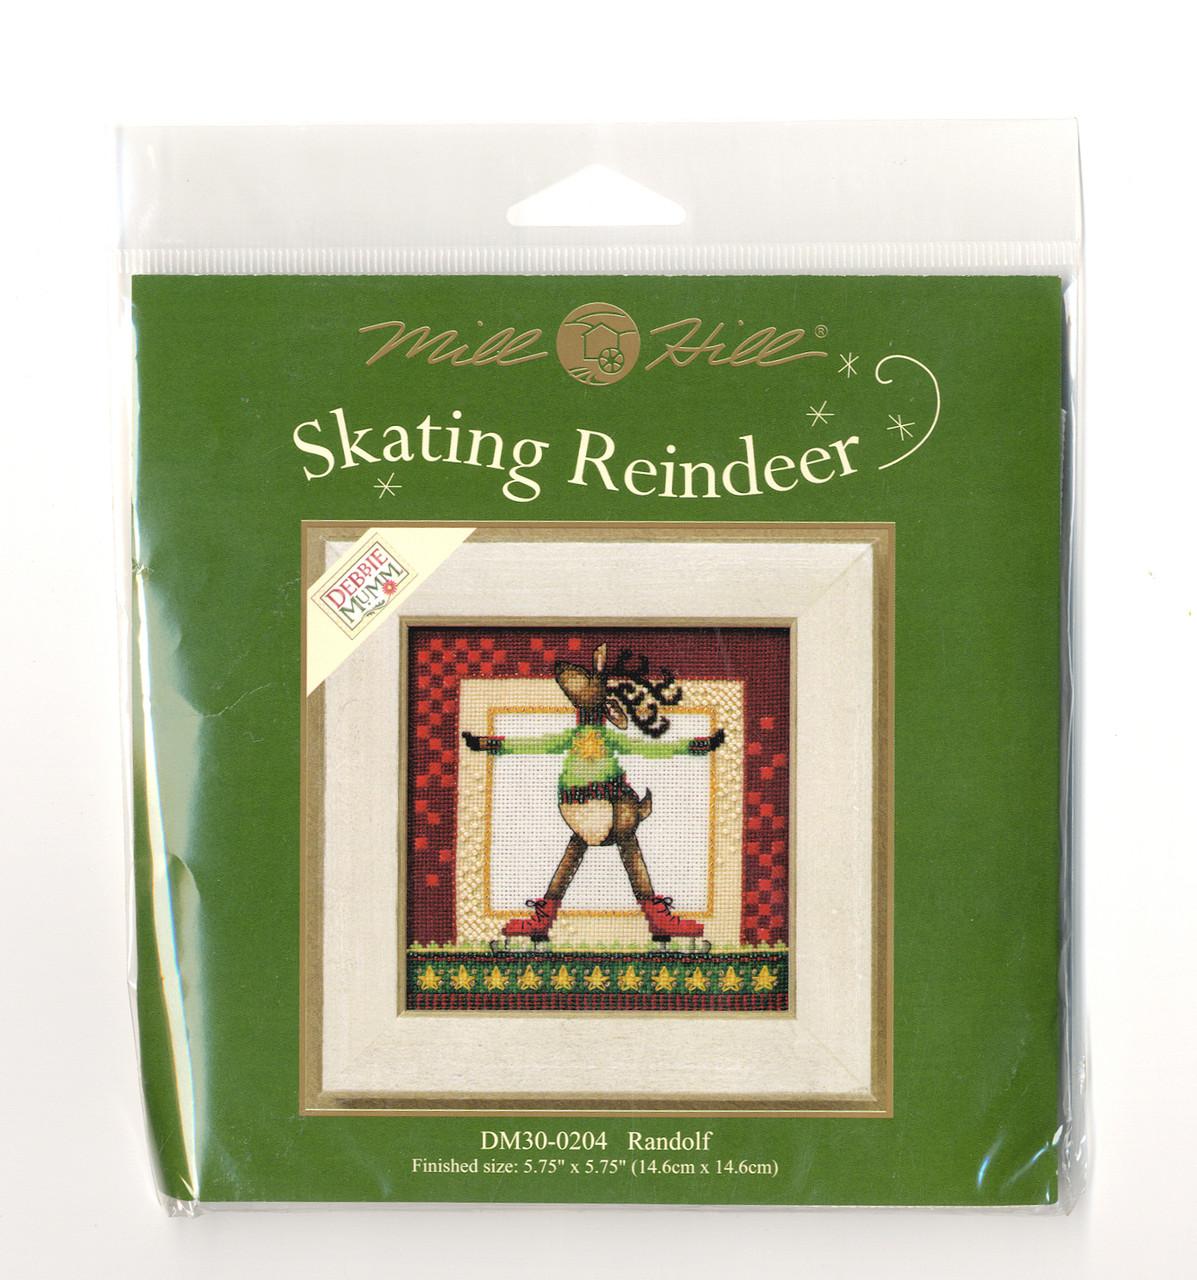 2010 Mill Hill Debbie Mumm Skating Reindeer - Randolf